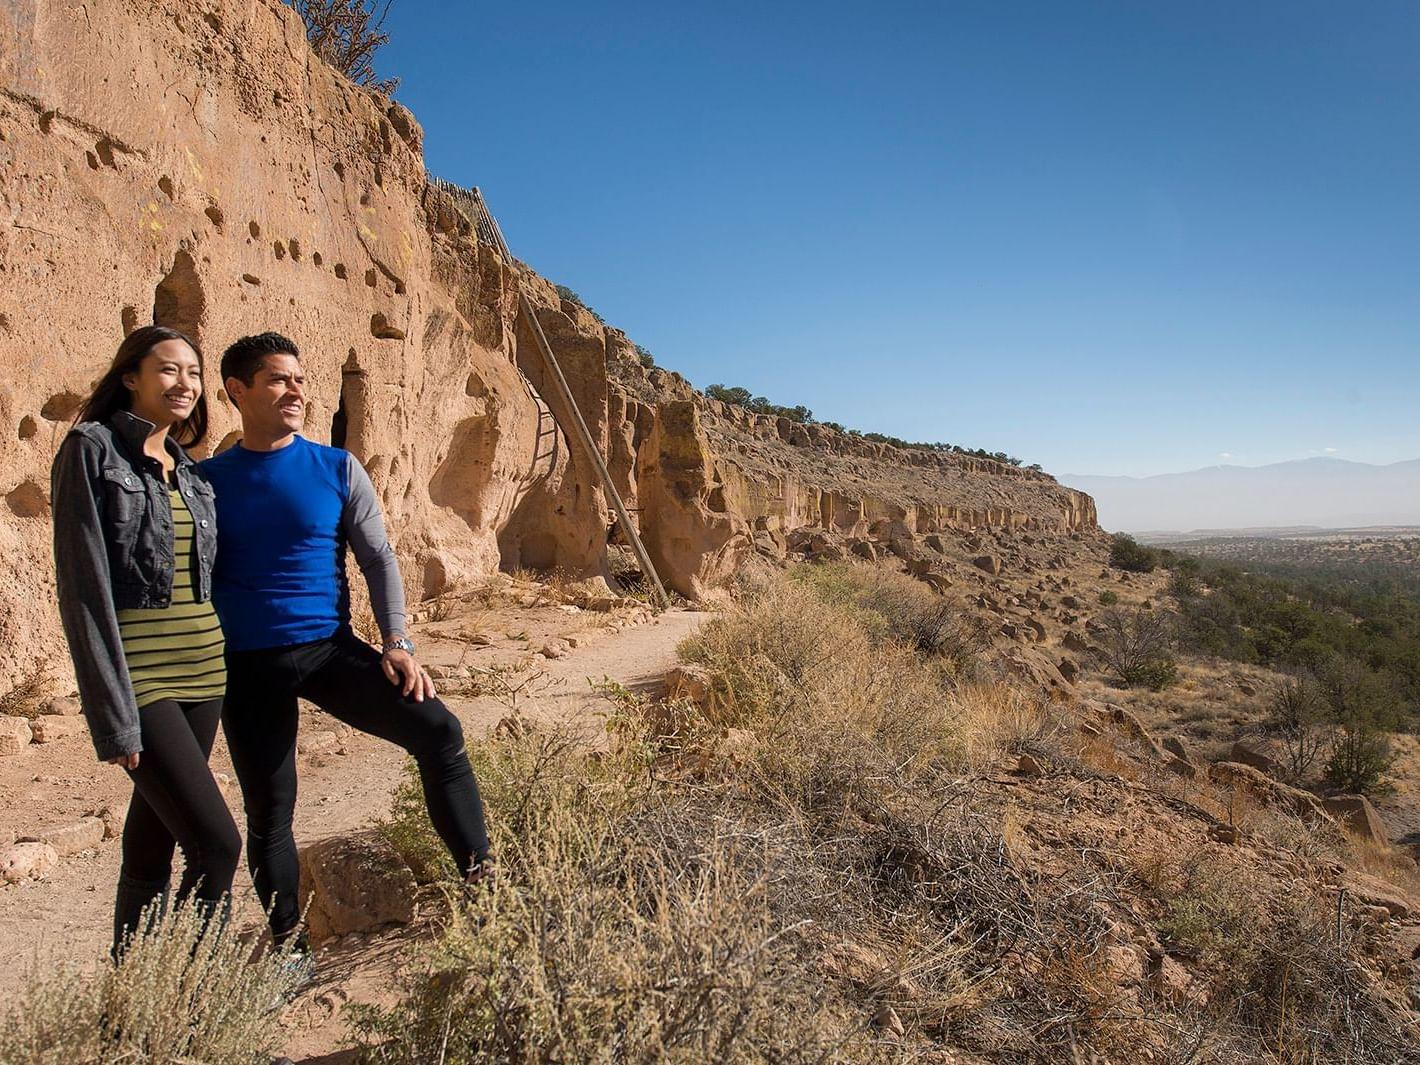 Couple enjoying in Puye cliff dwellings near Santa Claran Hotel Casino